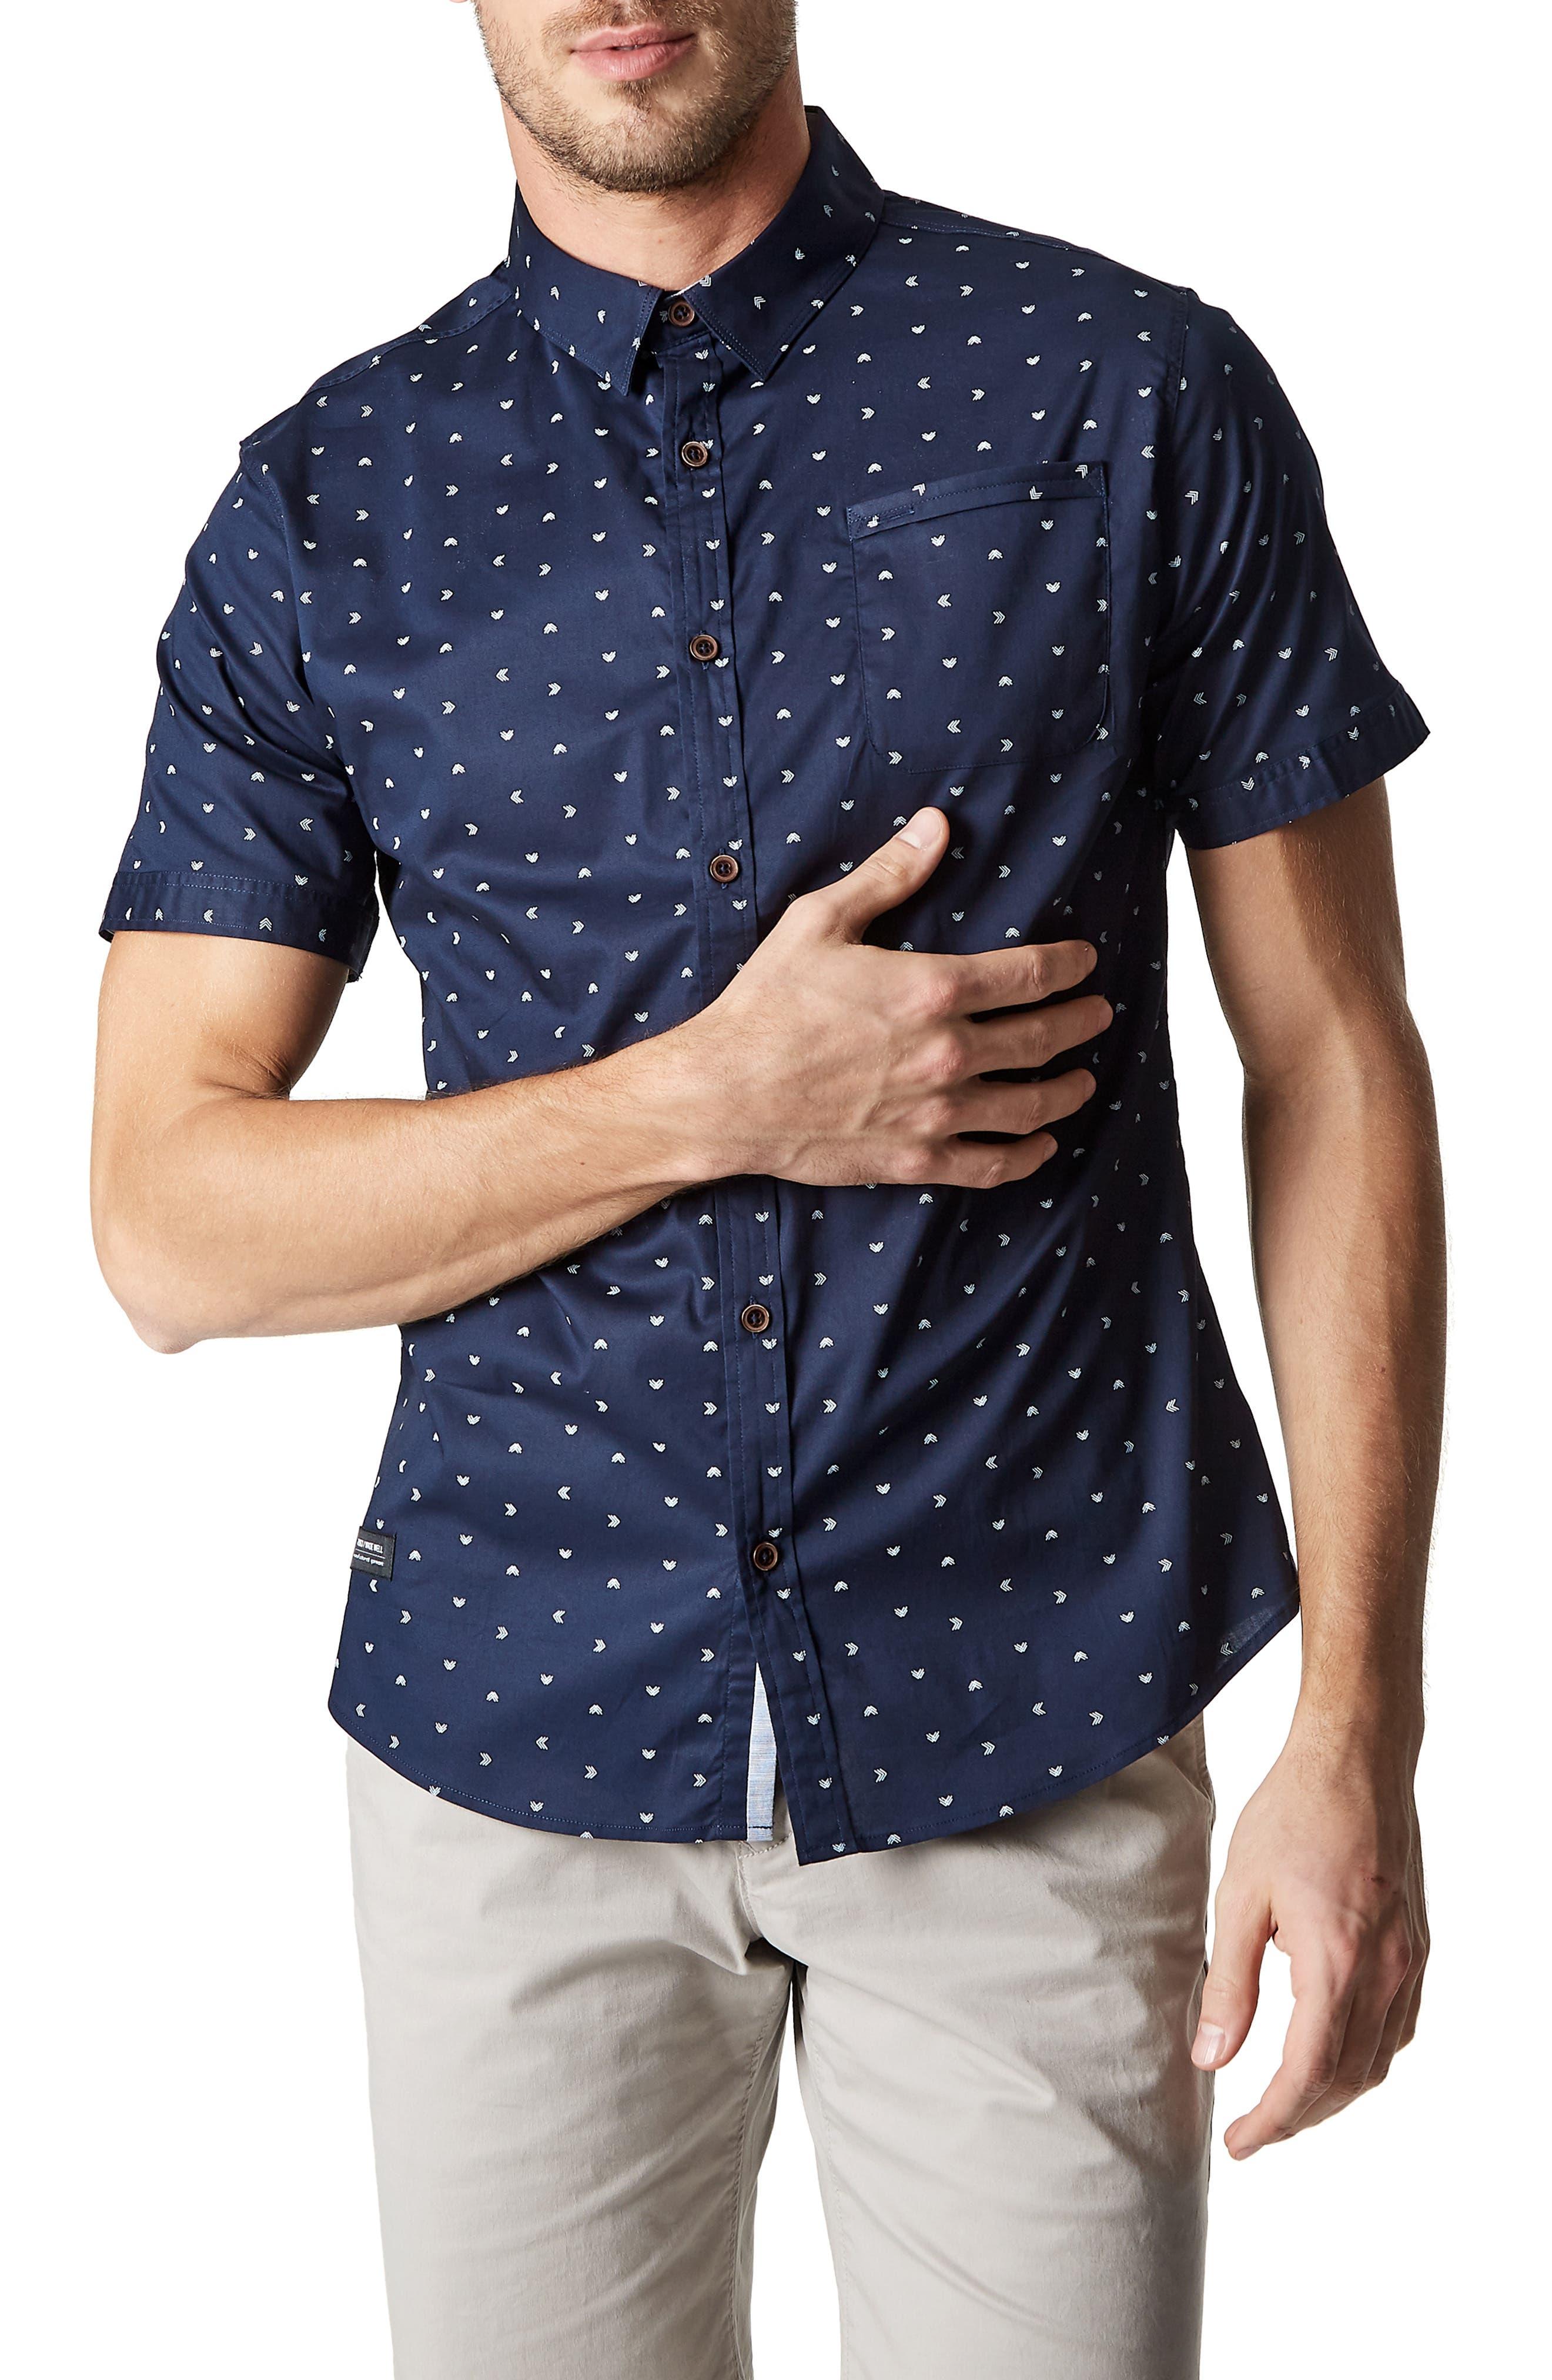 7 DIAMONDS Rhythm Nation Trim Fit Stretch Short Sleeve Sport Shirt, Main, color, NAVY